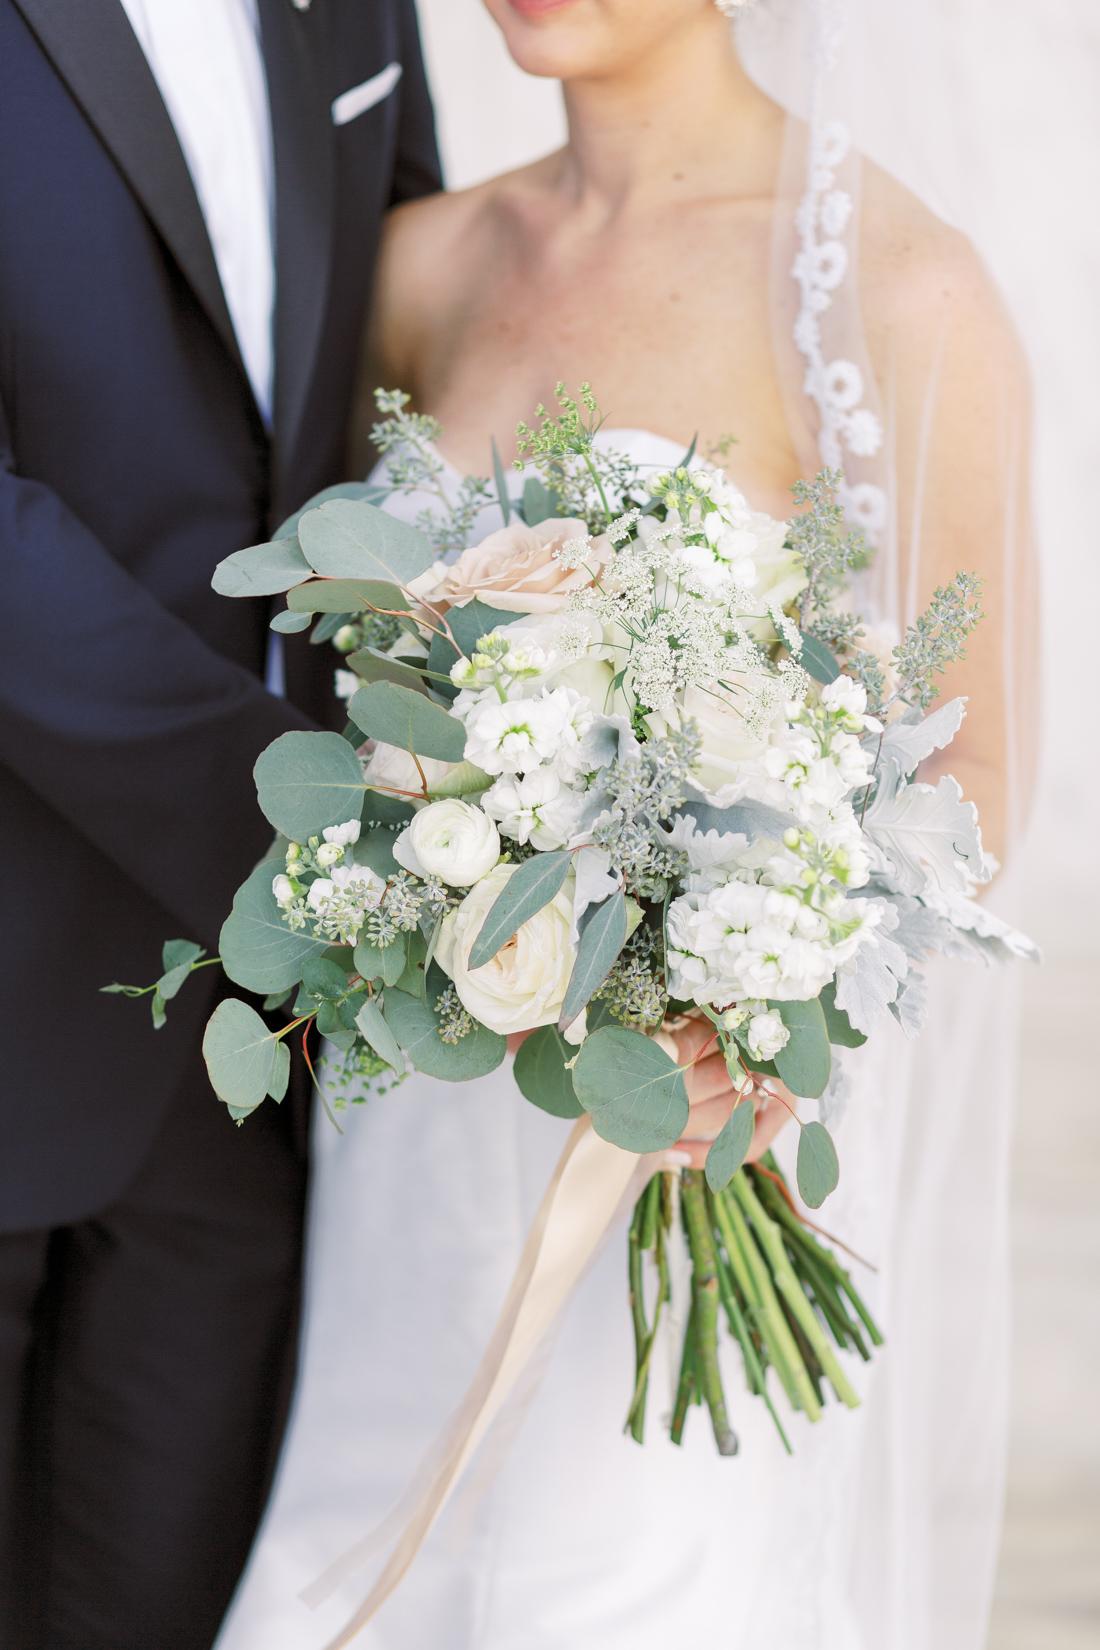 holly-frisch-wedding-bouquet-washington-dc